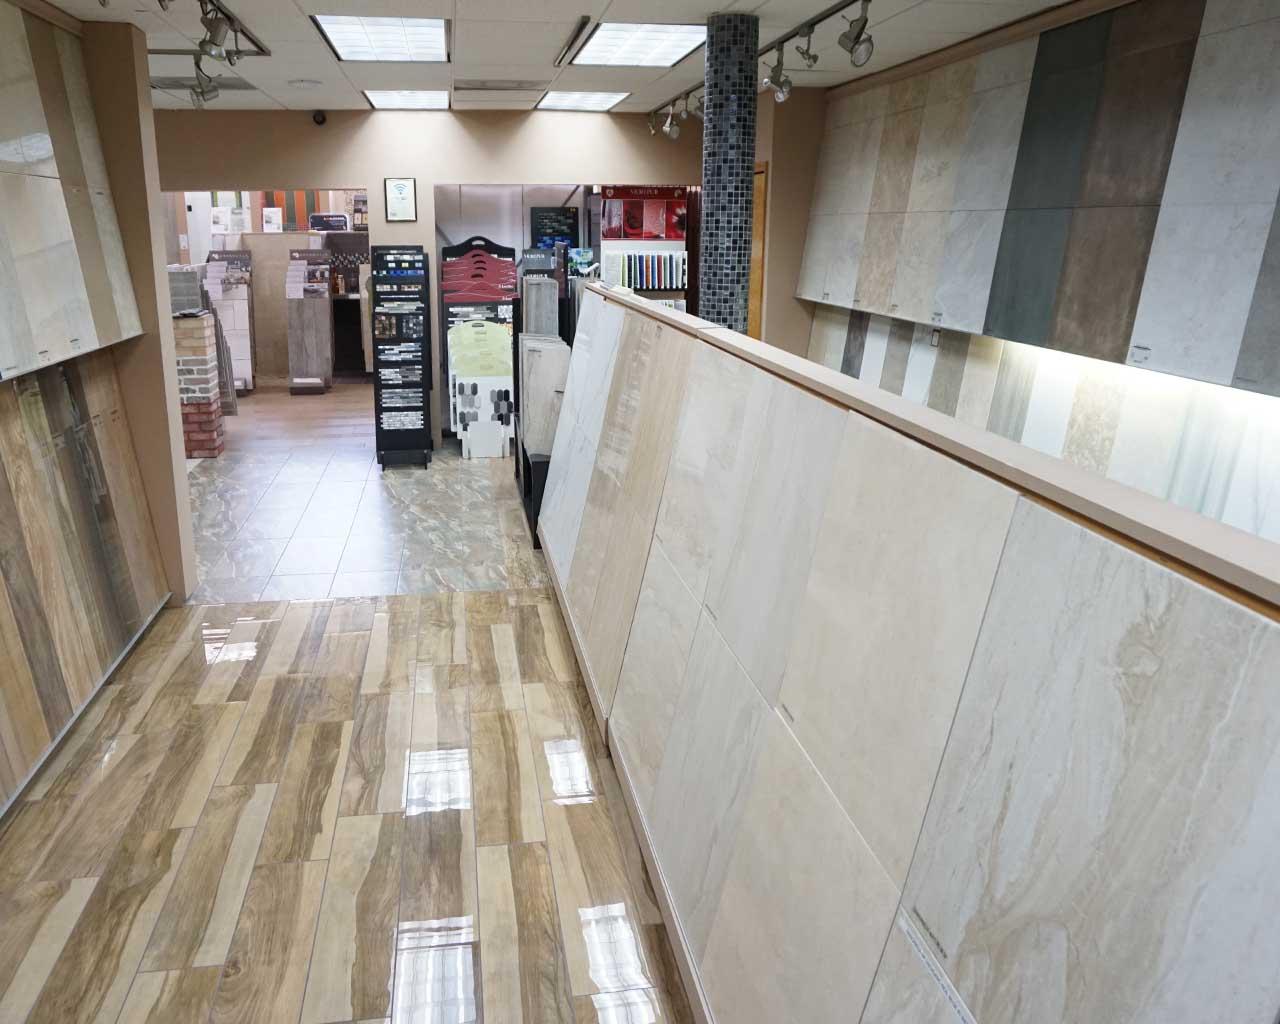 ein Fliesen-Showroom eines großen US-Distributors in Hialeah